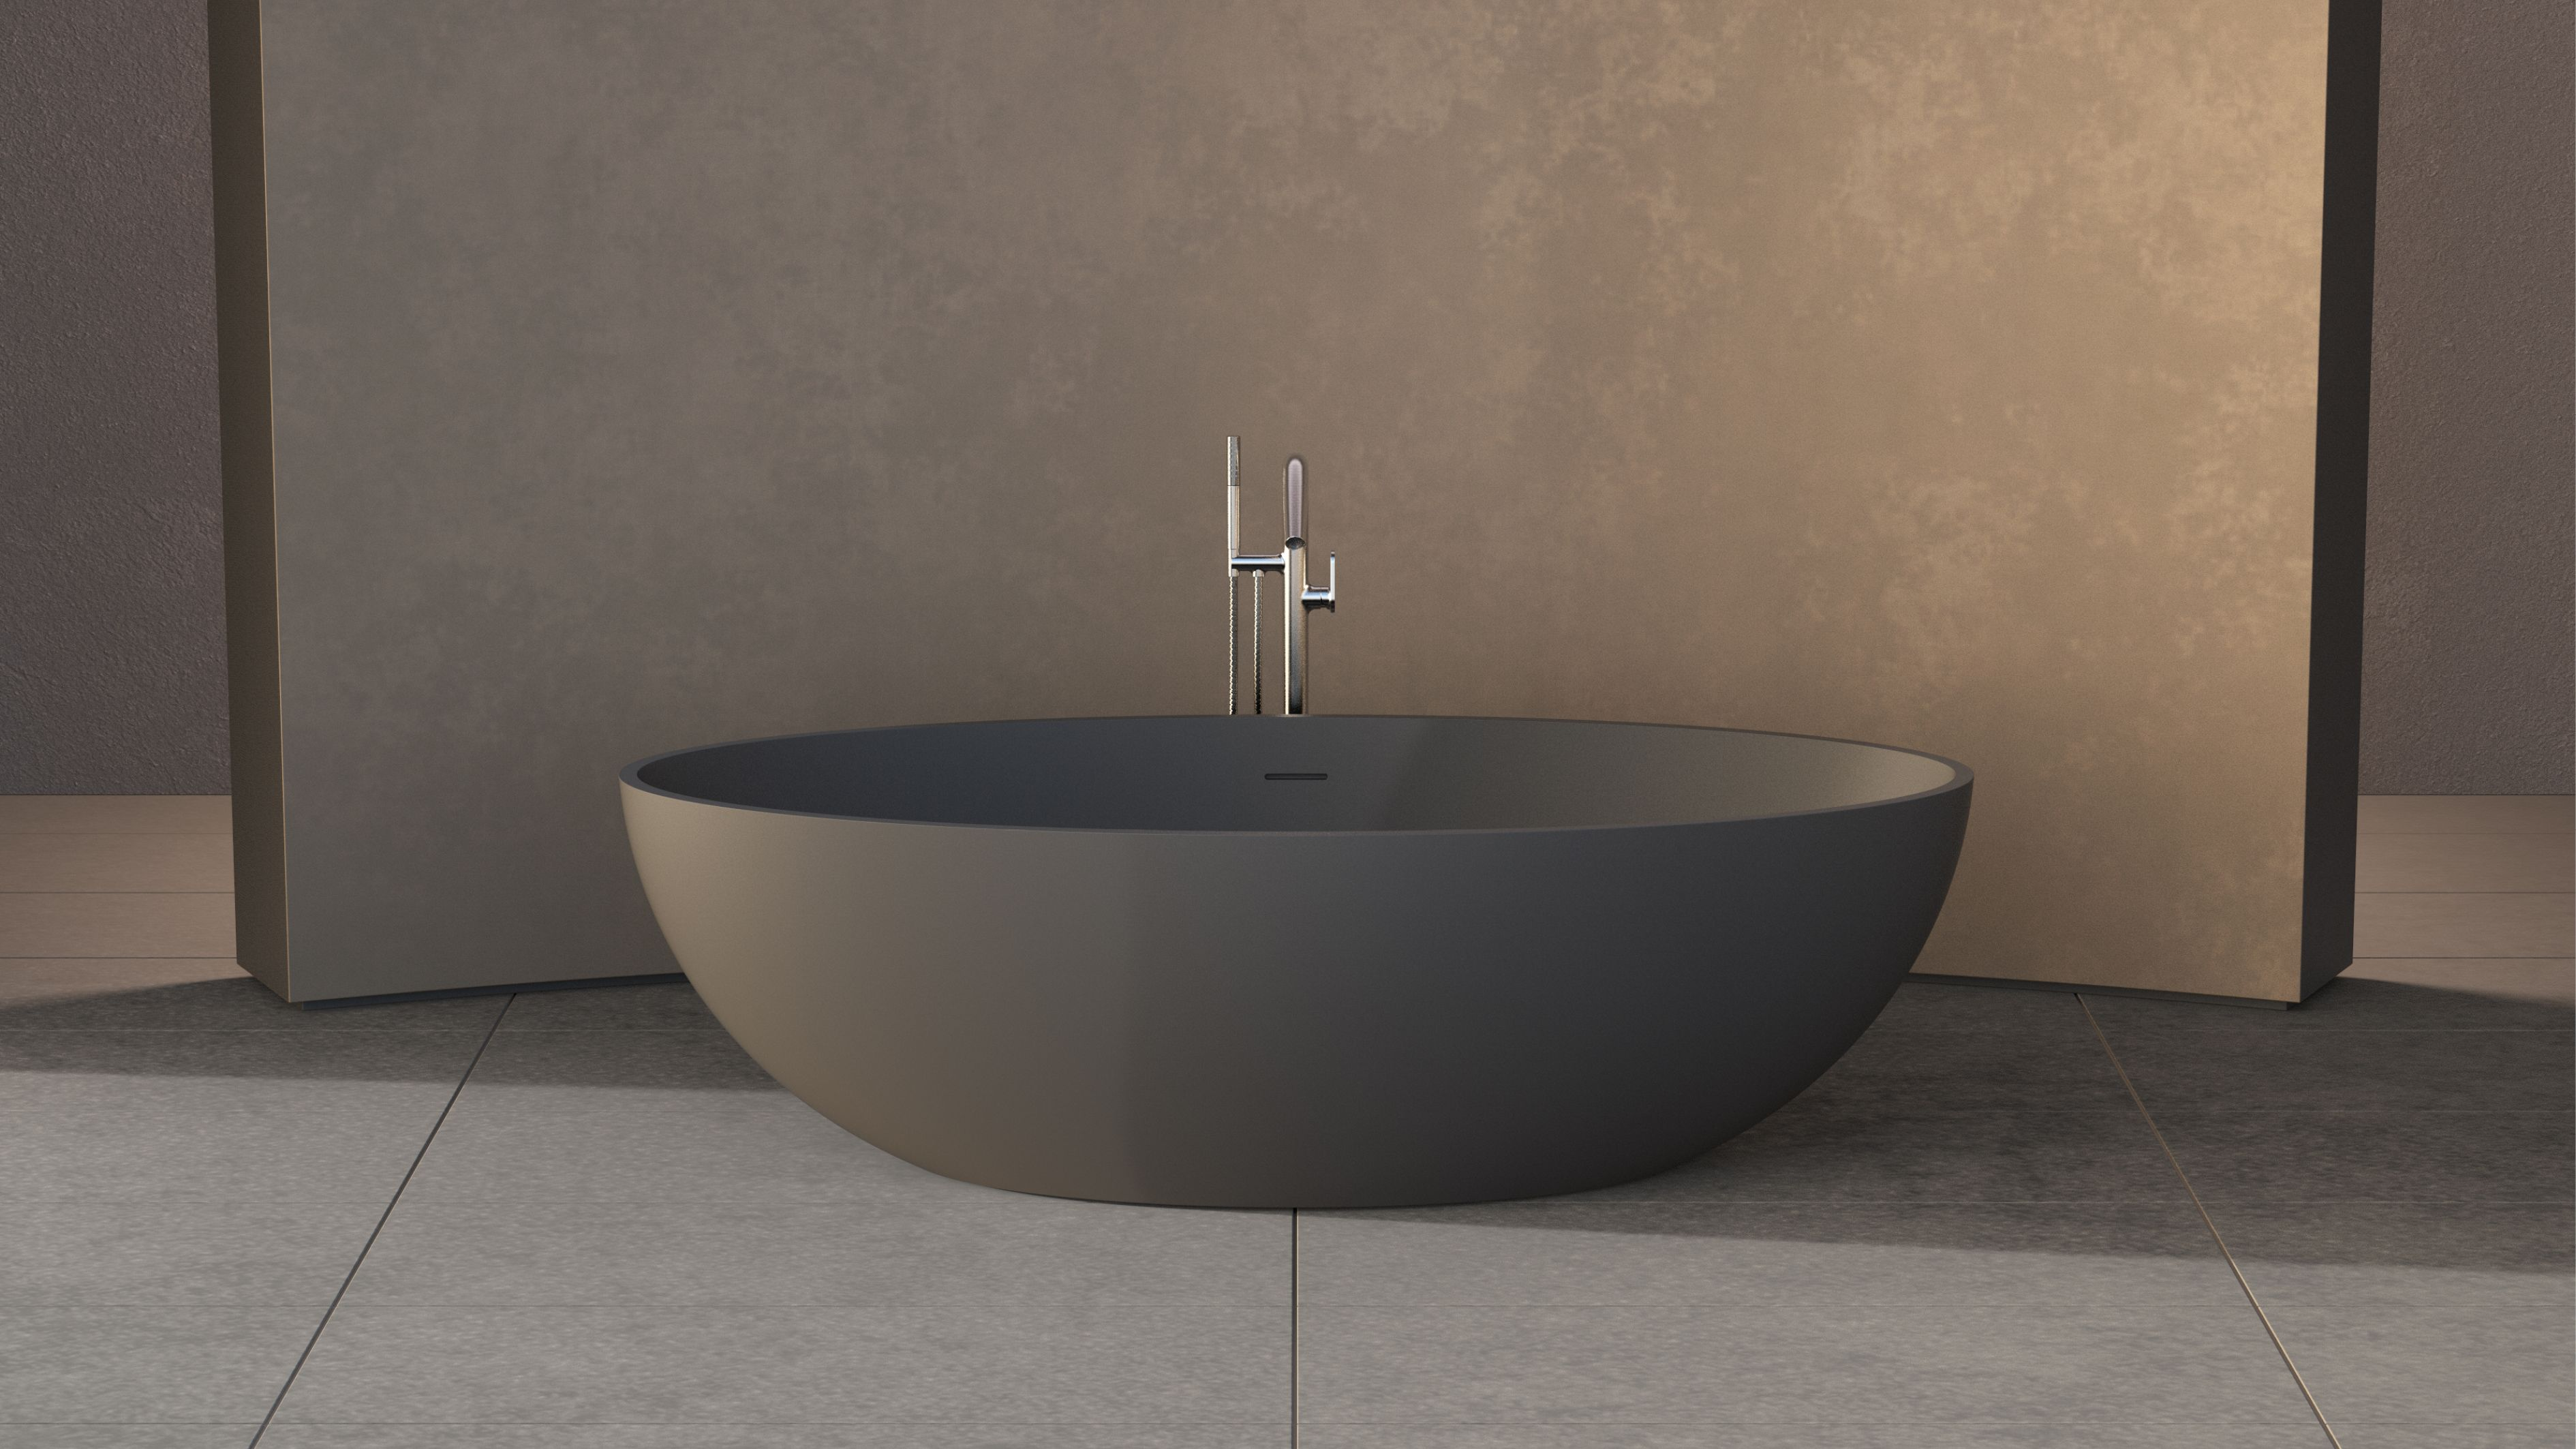 New Solidellipse Freestanding Bathtub Size : 1800x880x550mm Solid ...